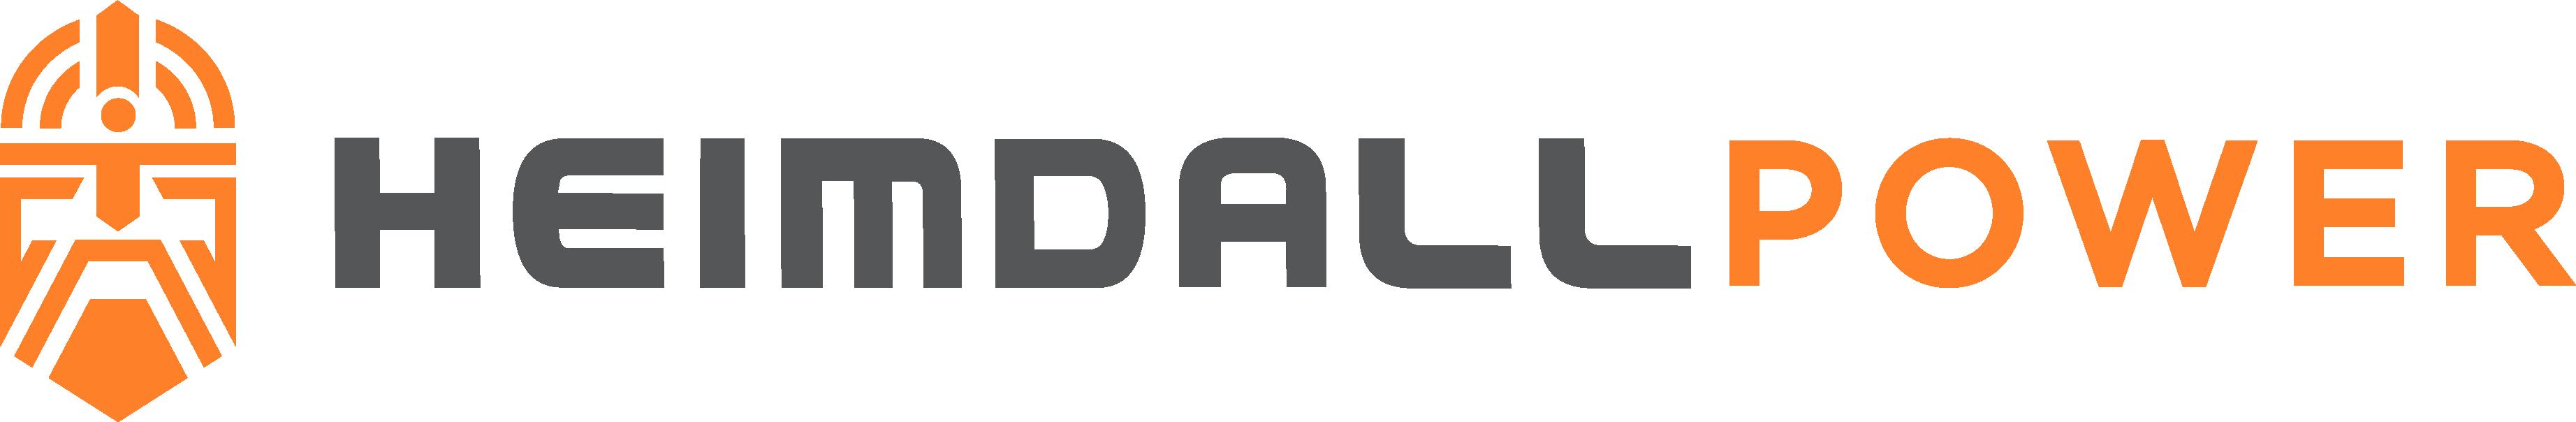 Heimdall Power logo - text on right